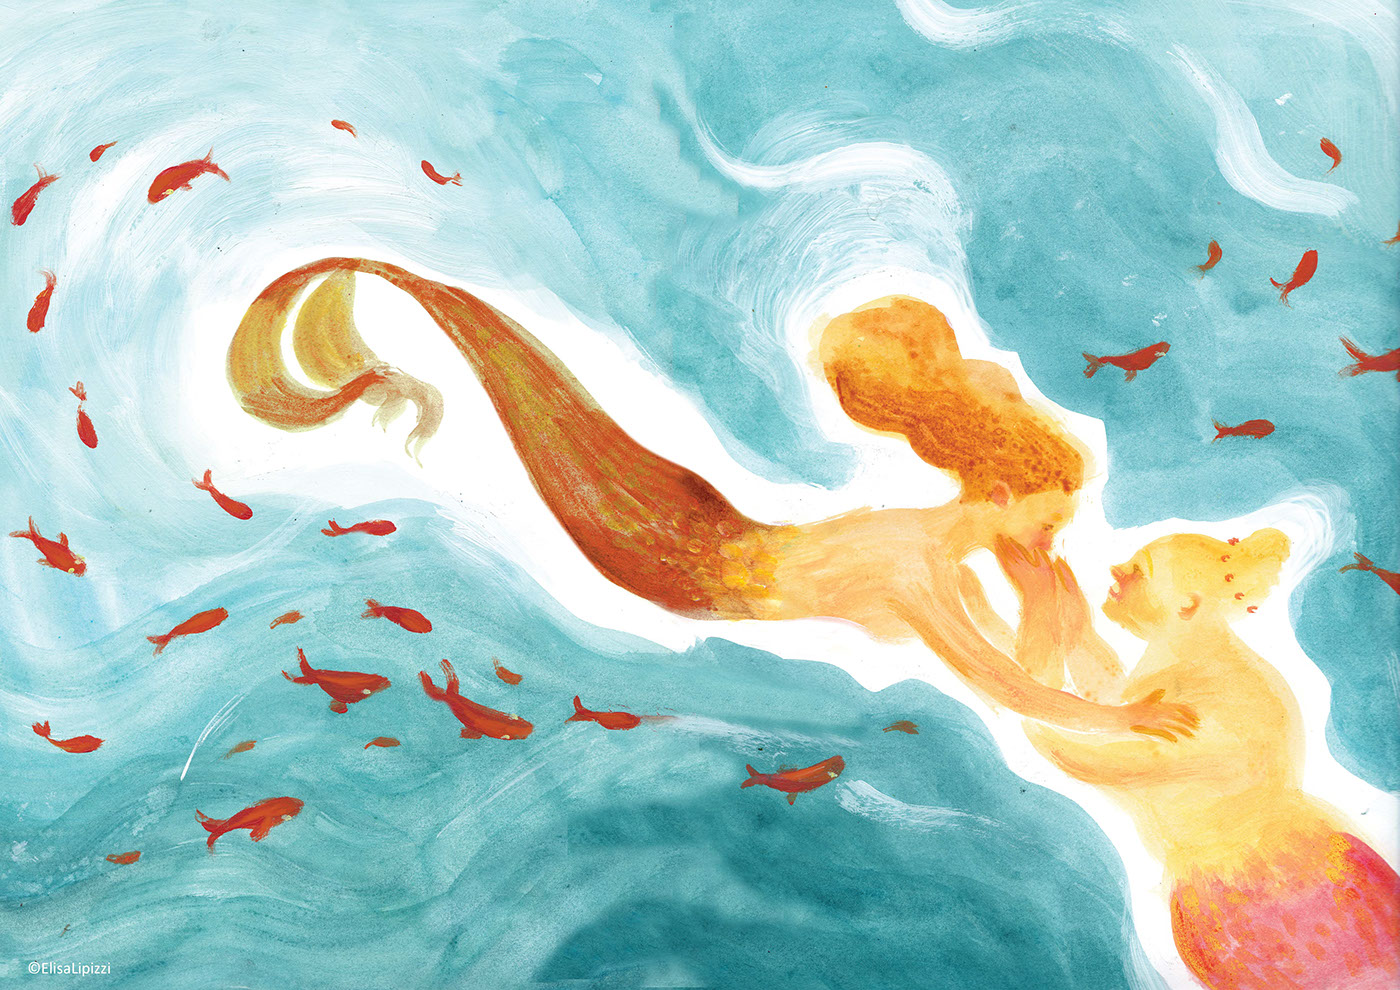 Sirenetta mermaid storyboard orecchio acerbo fiaba lipizzi elisa Palazzo